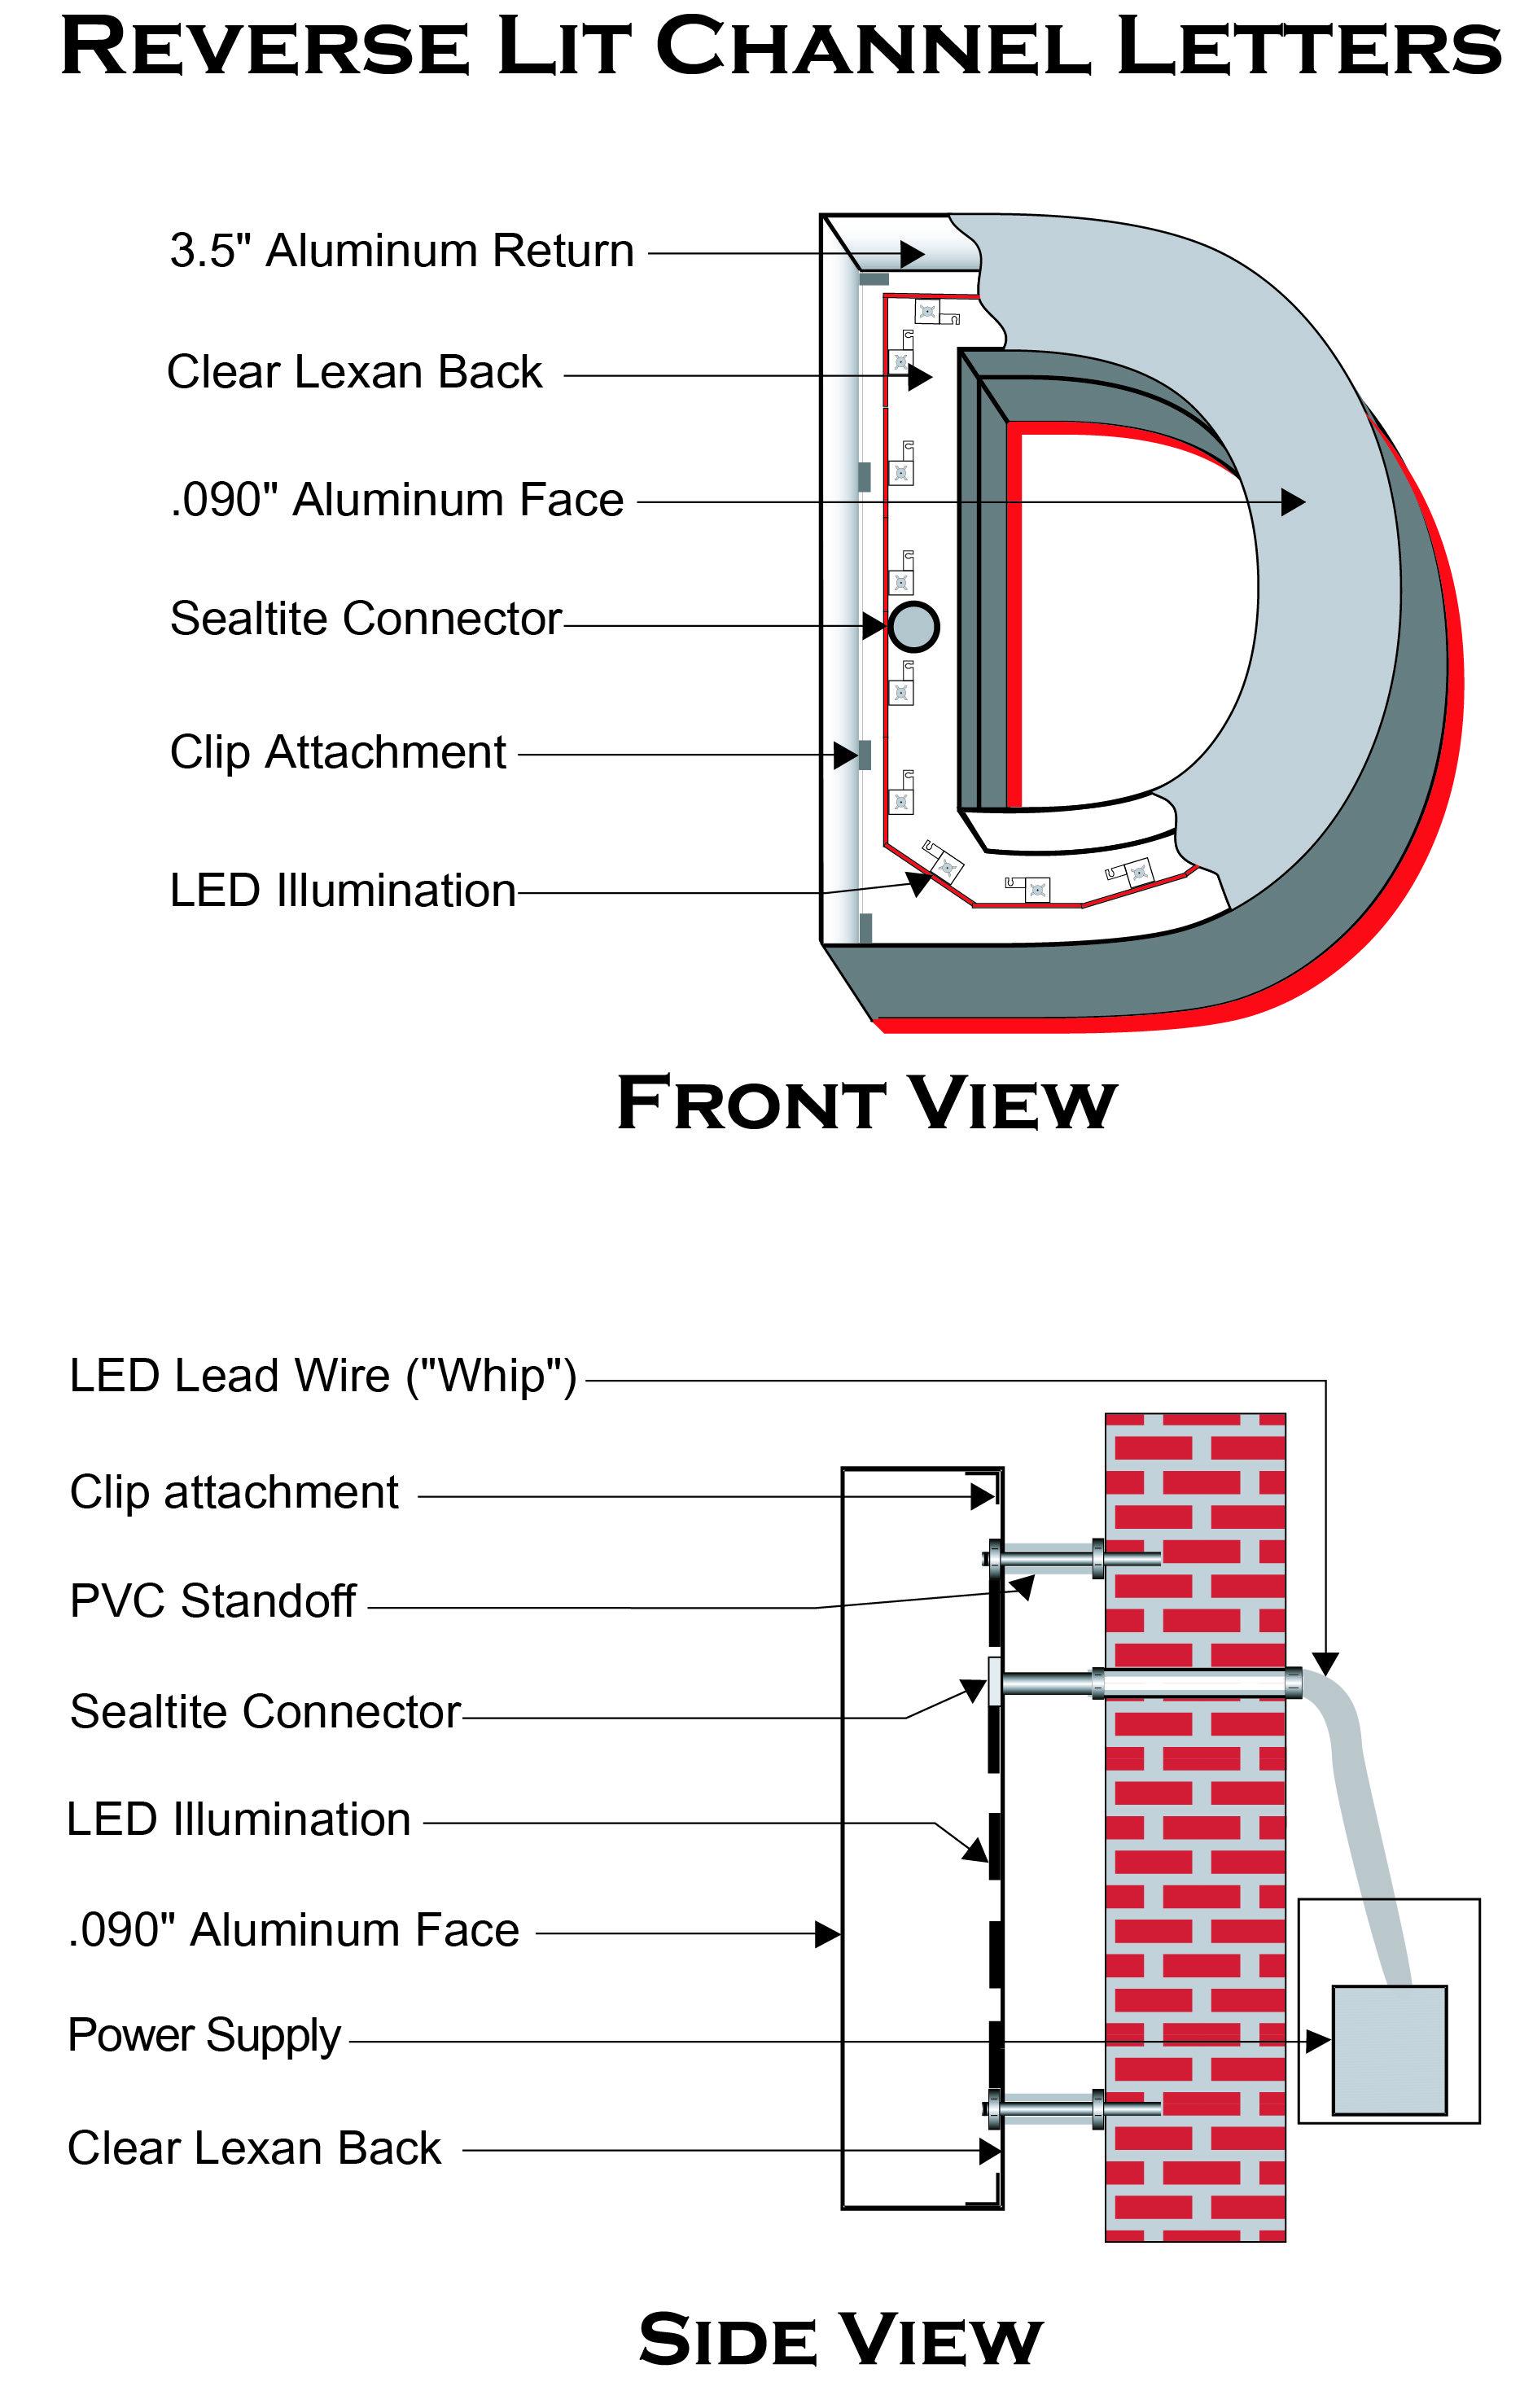 wiring diagram letters wiring diagram centre channel lettering sign wiring diagram schema wiring diagramreverse lit channel [ 1883 x 2958 Pixel ]